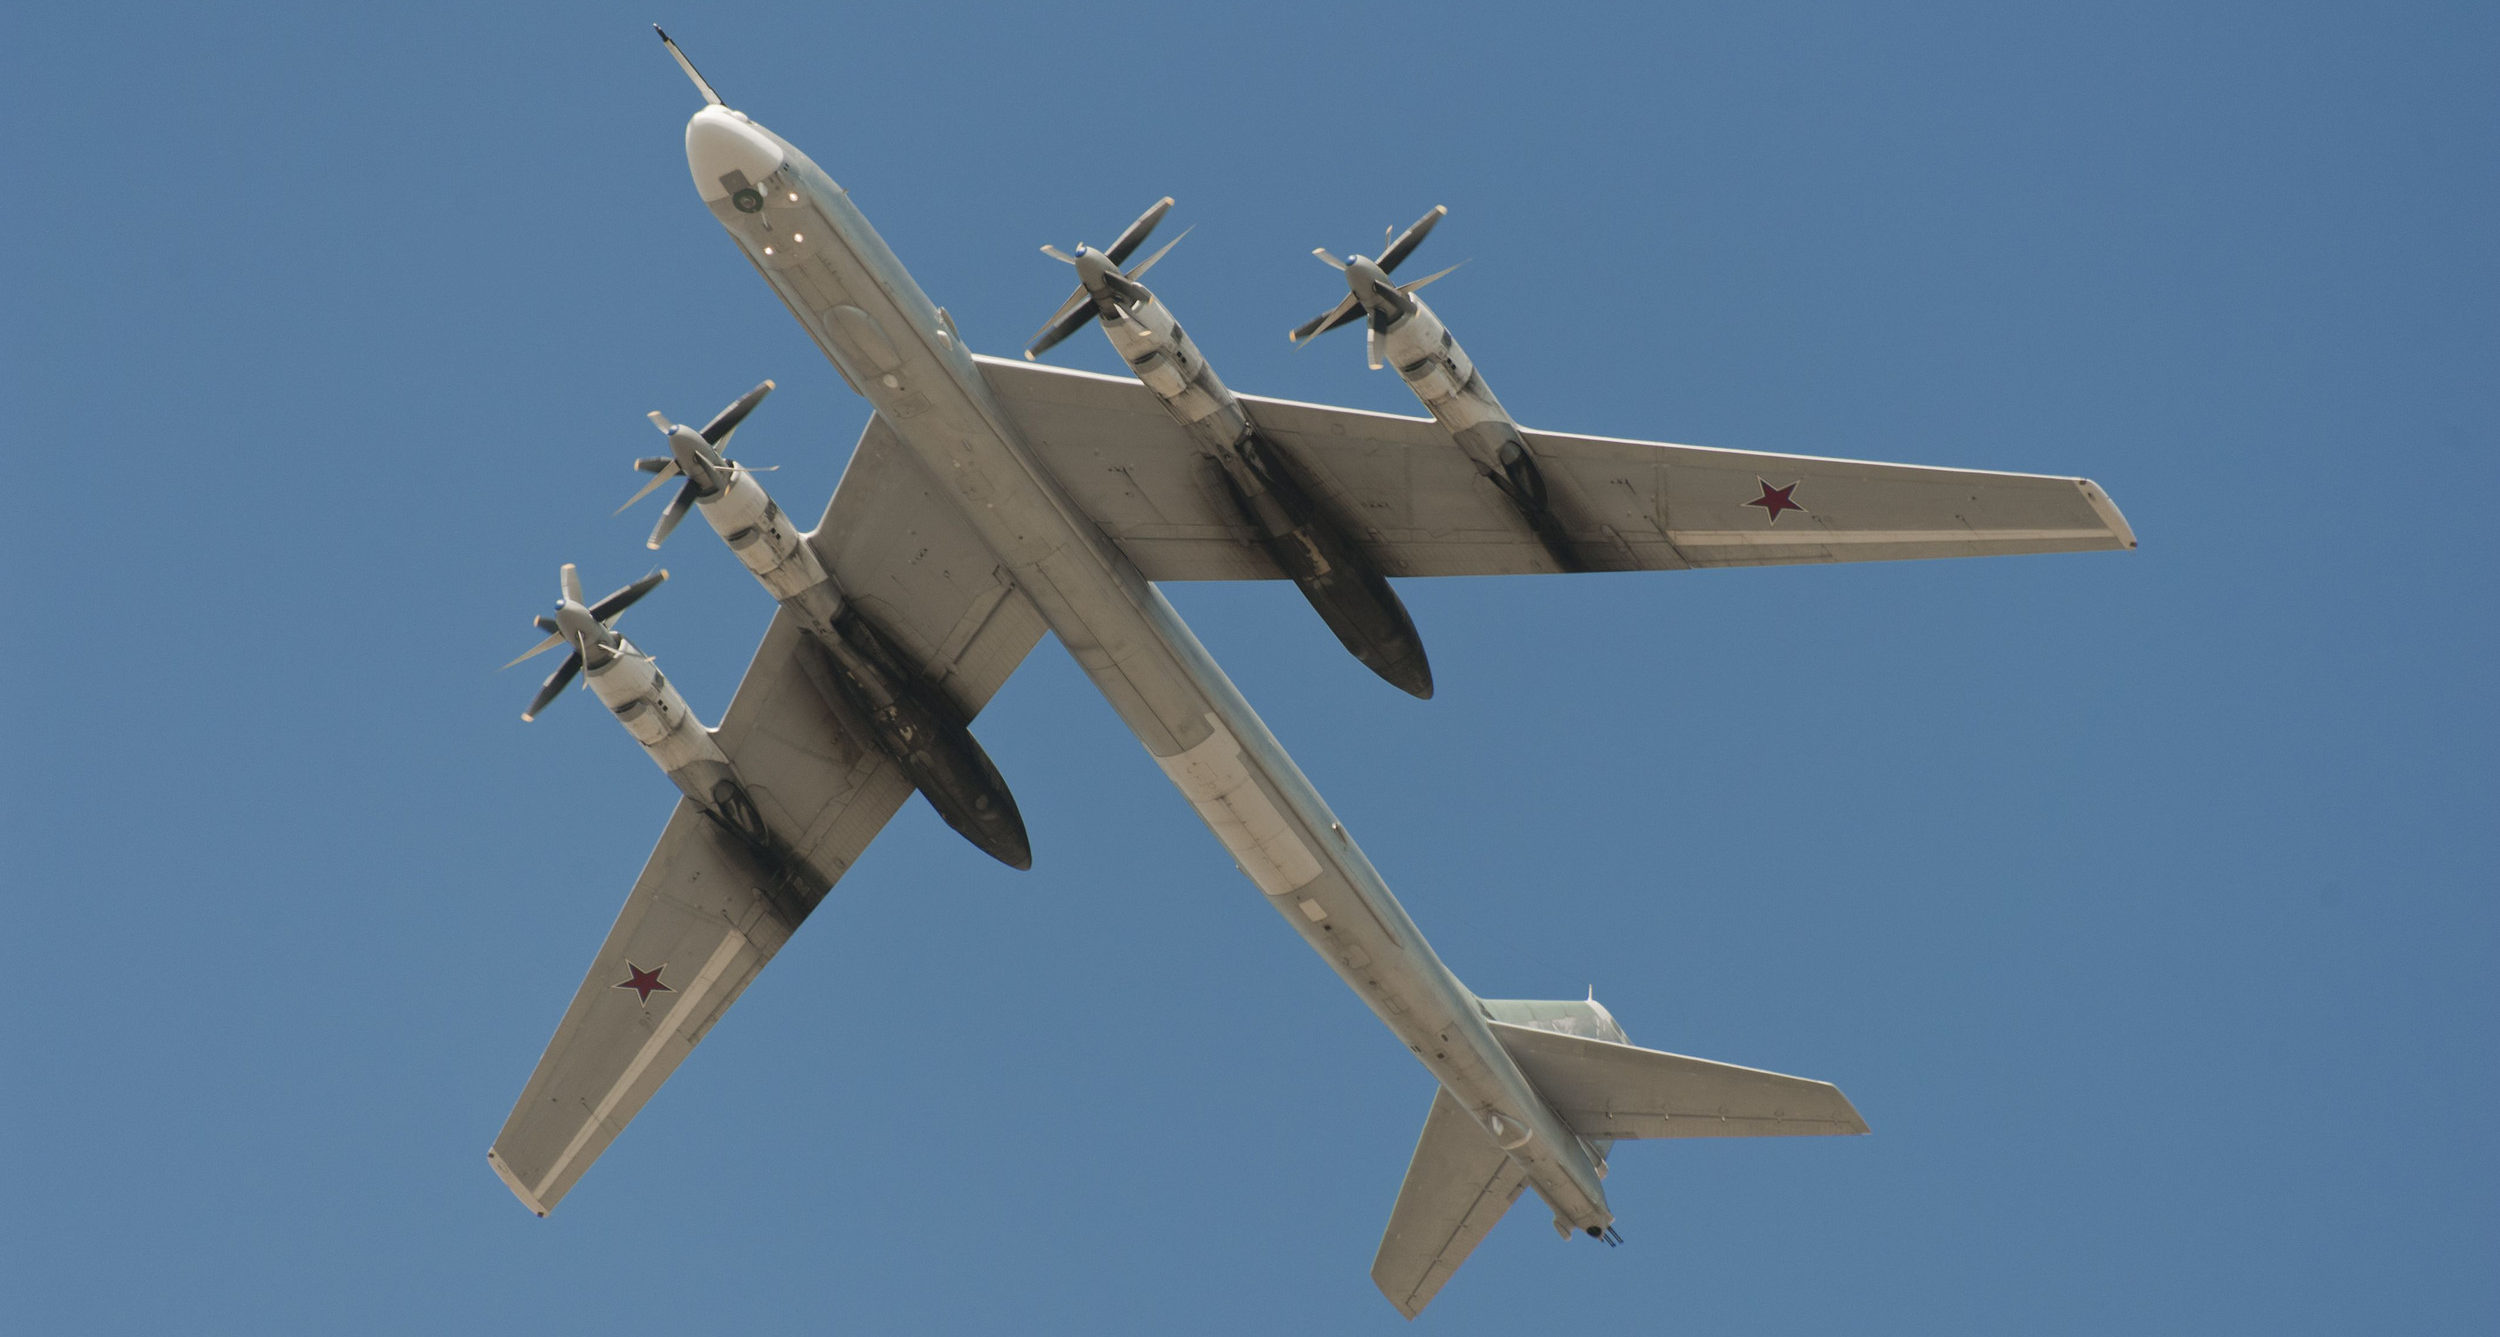 US, Canadian fighters intercept Russian bombers off Alaskan coast